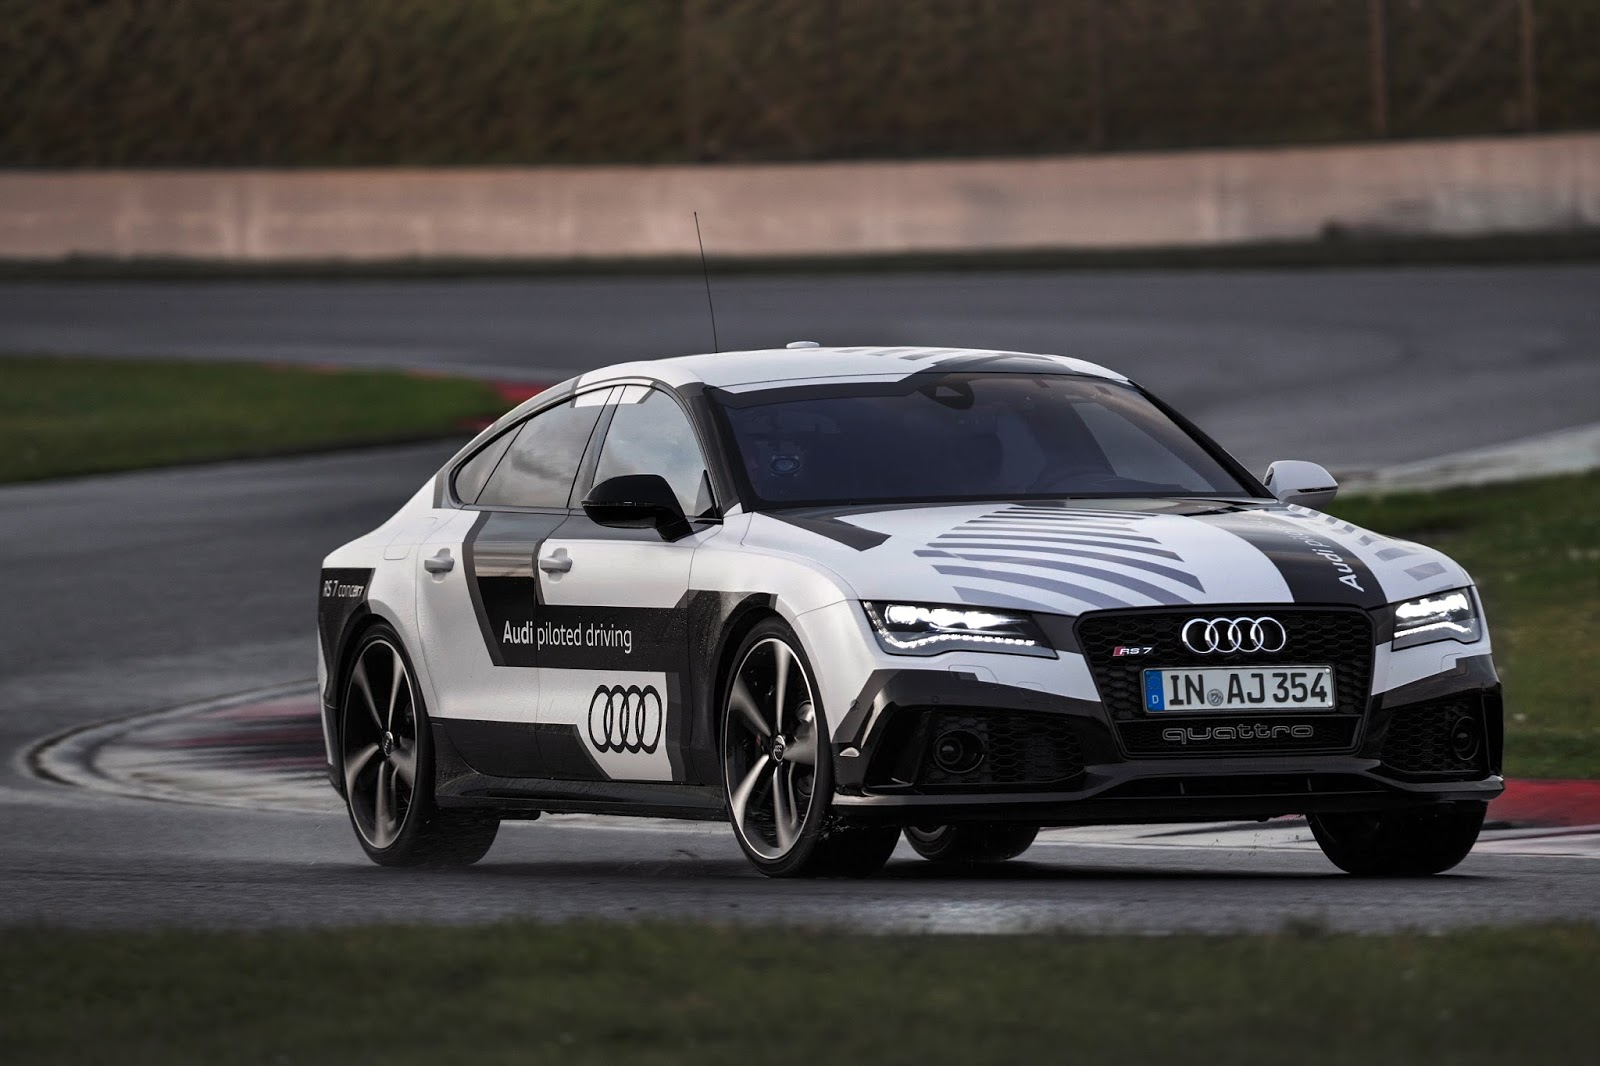 audi2 To 2016 έρχονται οι αγώνες αυτόνομων αυτοκινήτων! Audi, Audi RS7, zblog, αγωνες